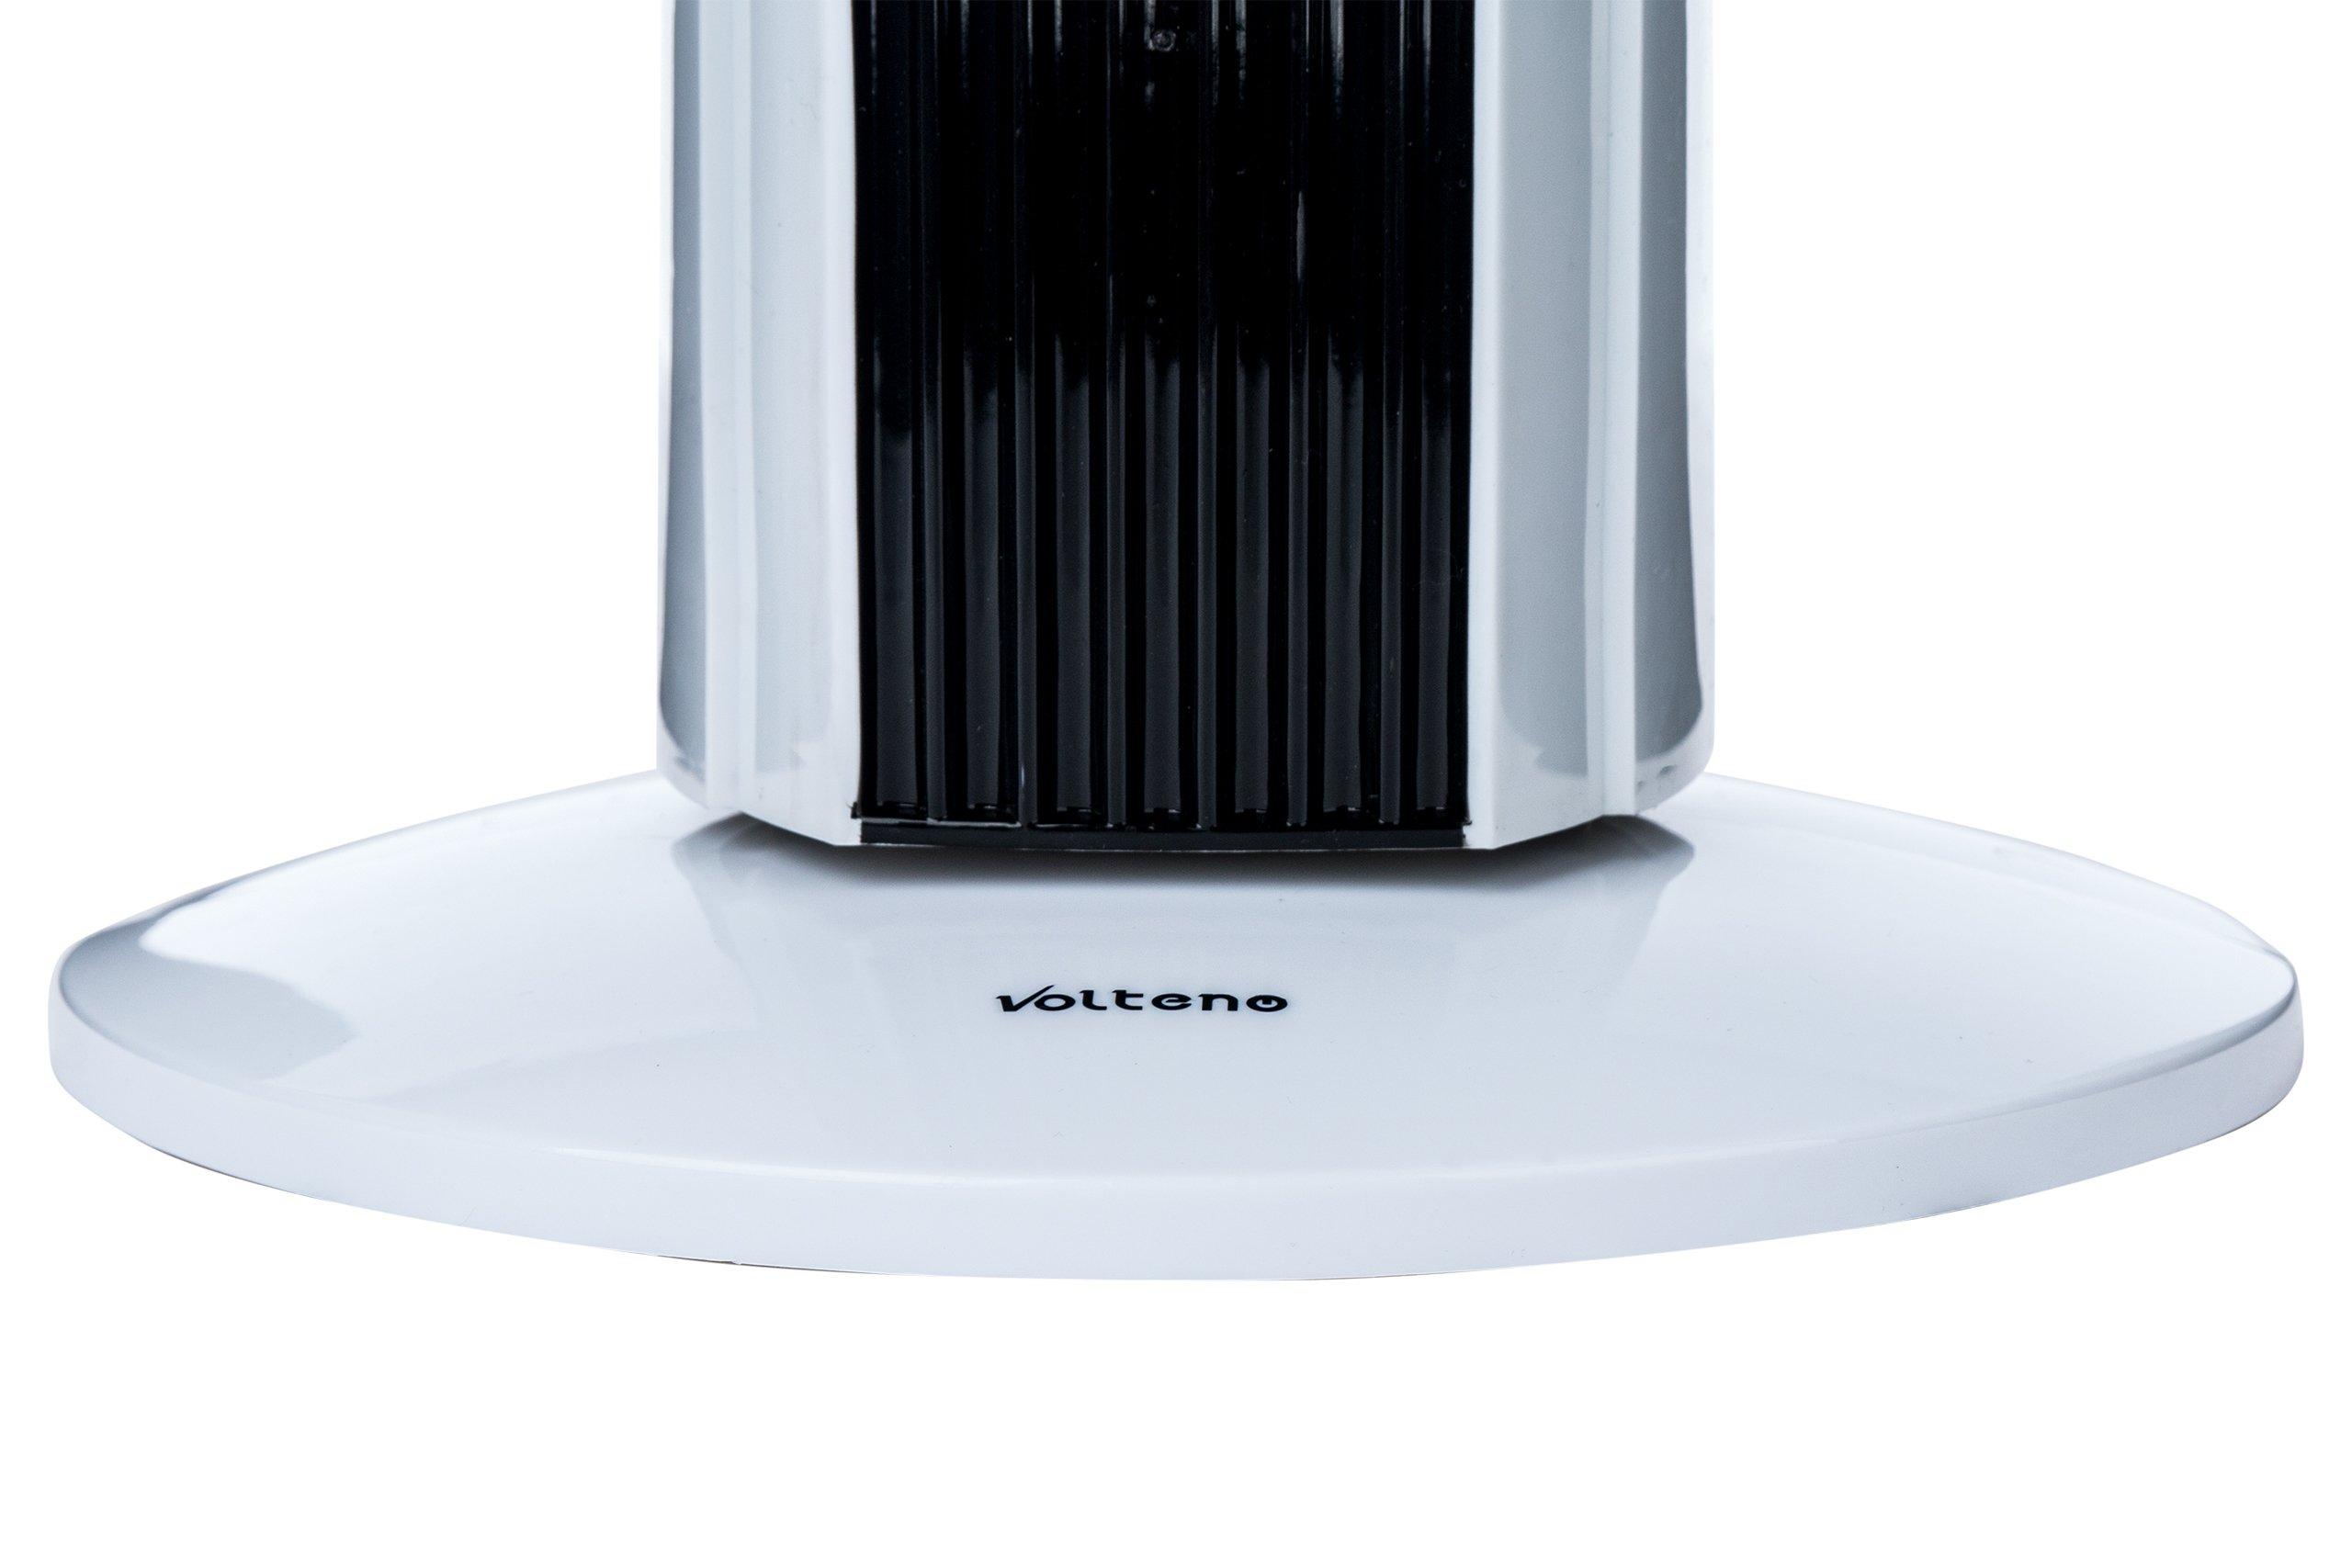 standventilator turmventilator s ulenventilator fb s ulen turm ventilator 80cm ebay. Black Bedroom Furniture Sets. Home Design Ideas